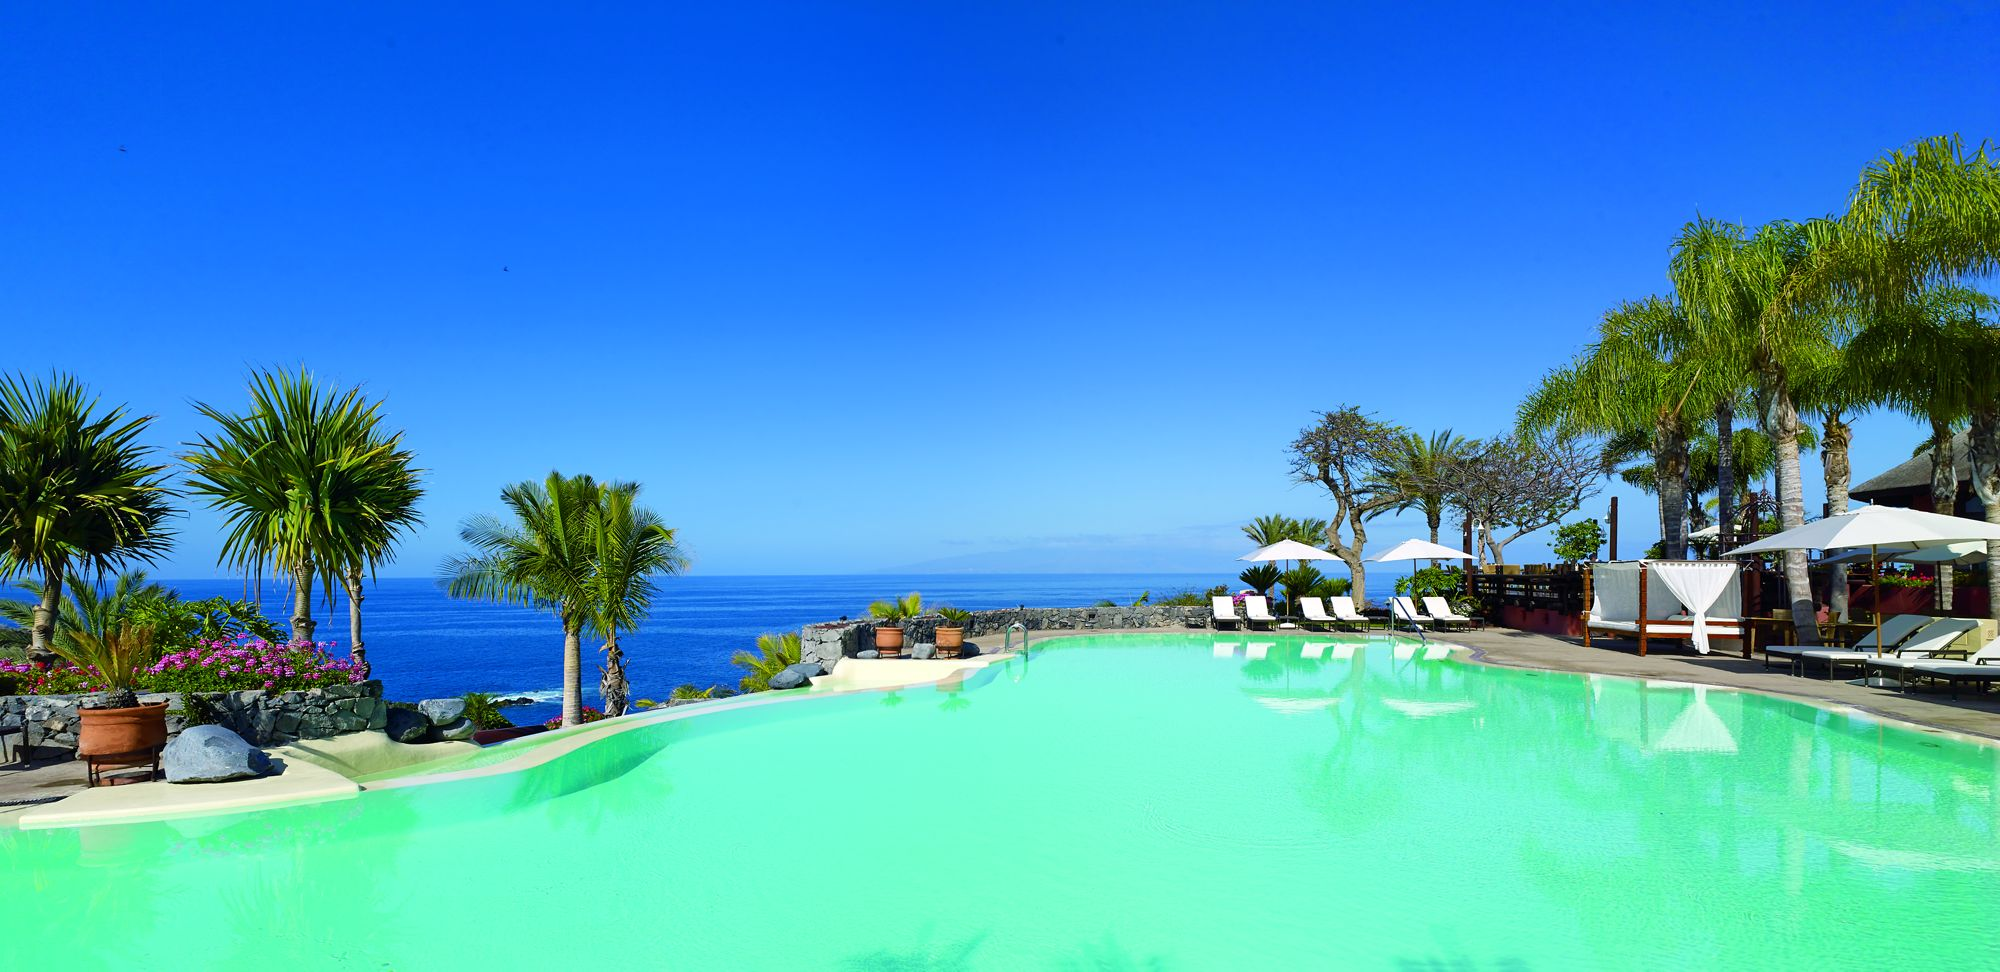 Spain Luxury Hotels Beach Resorts